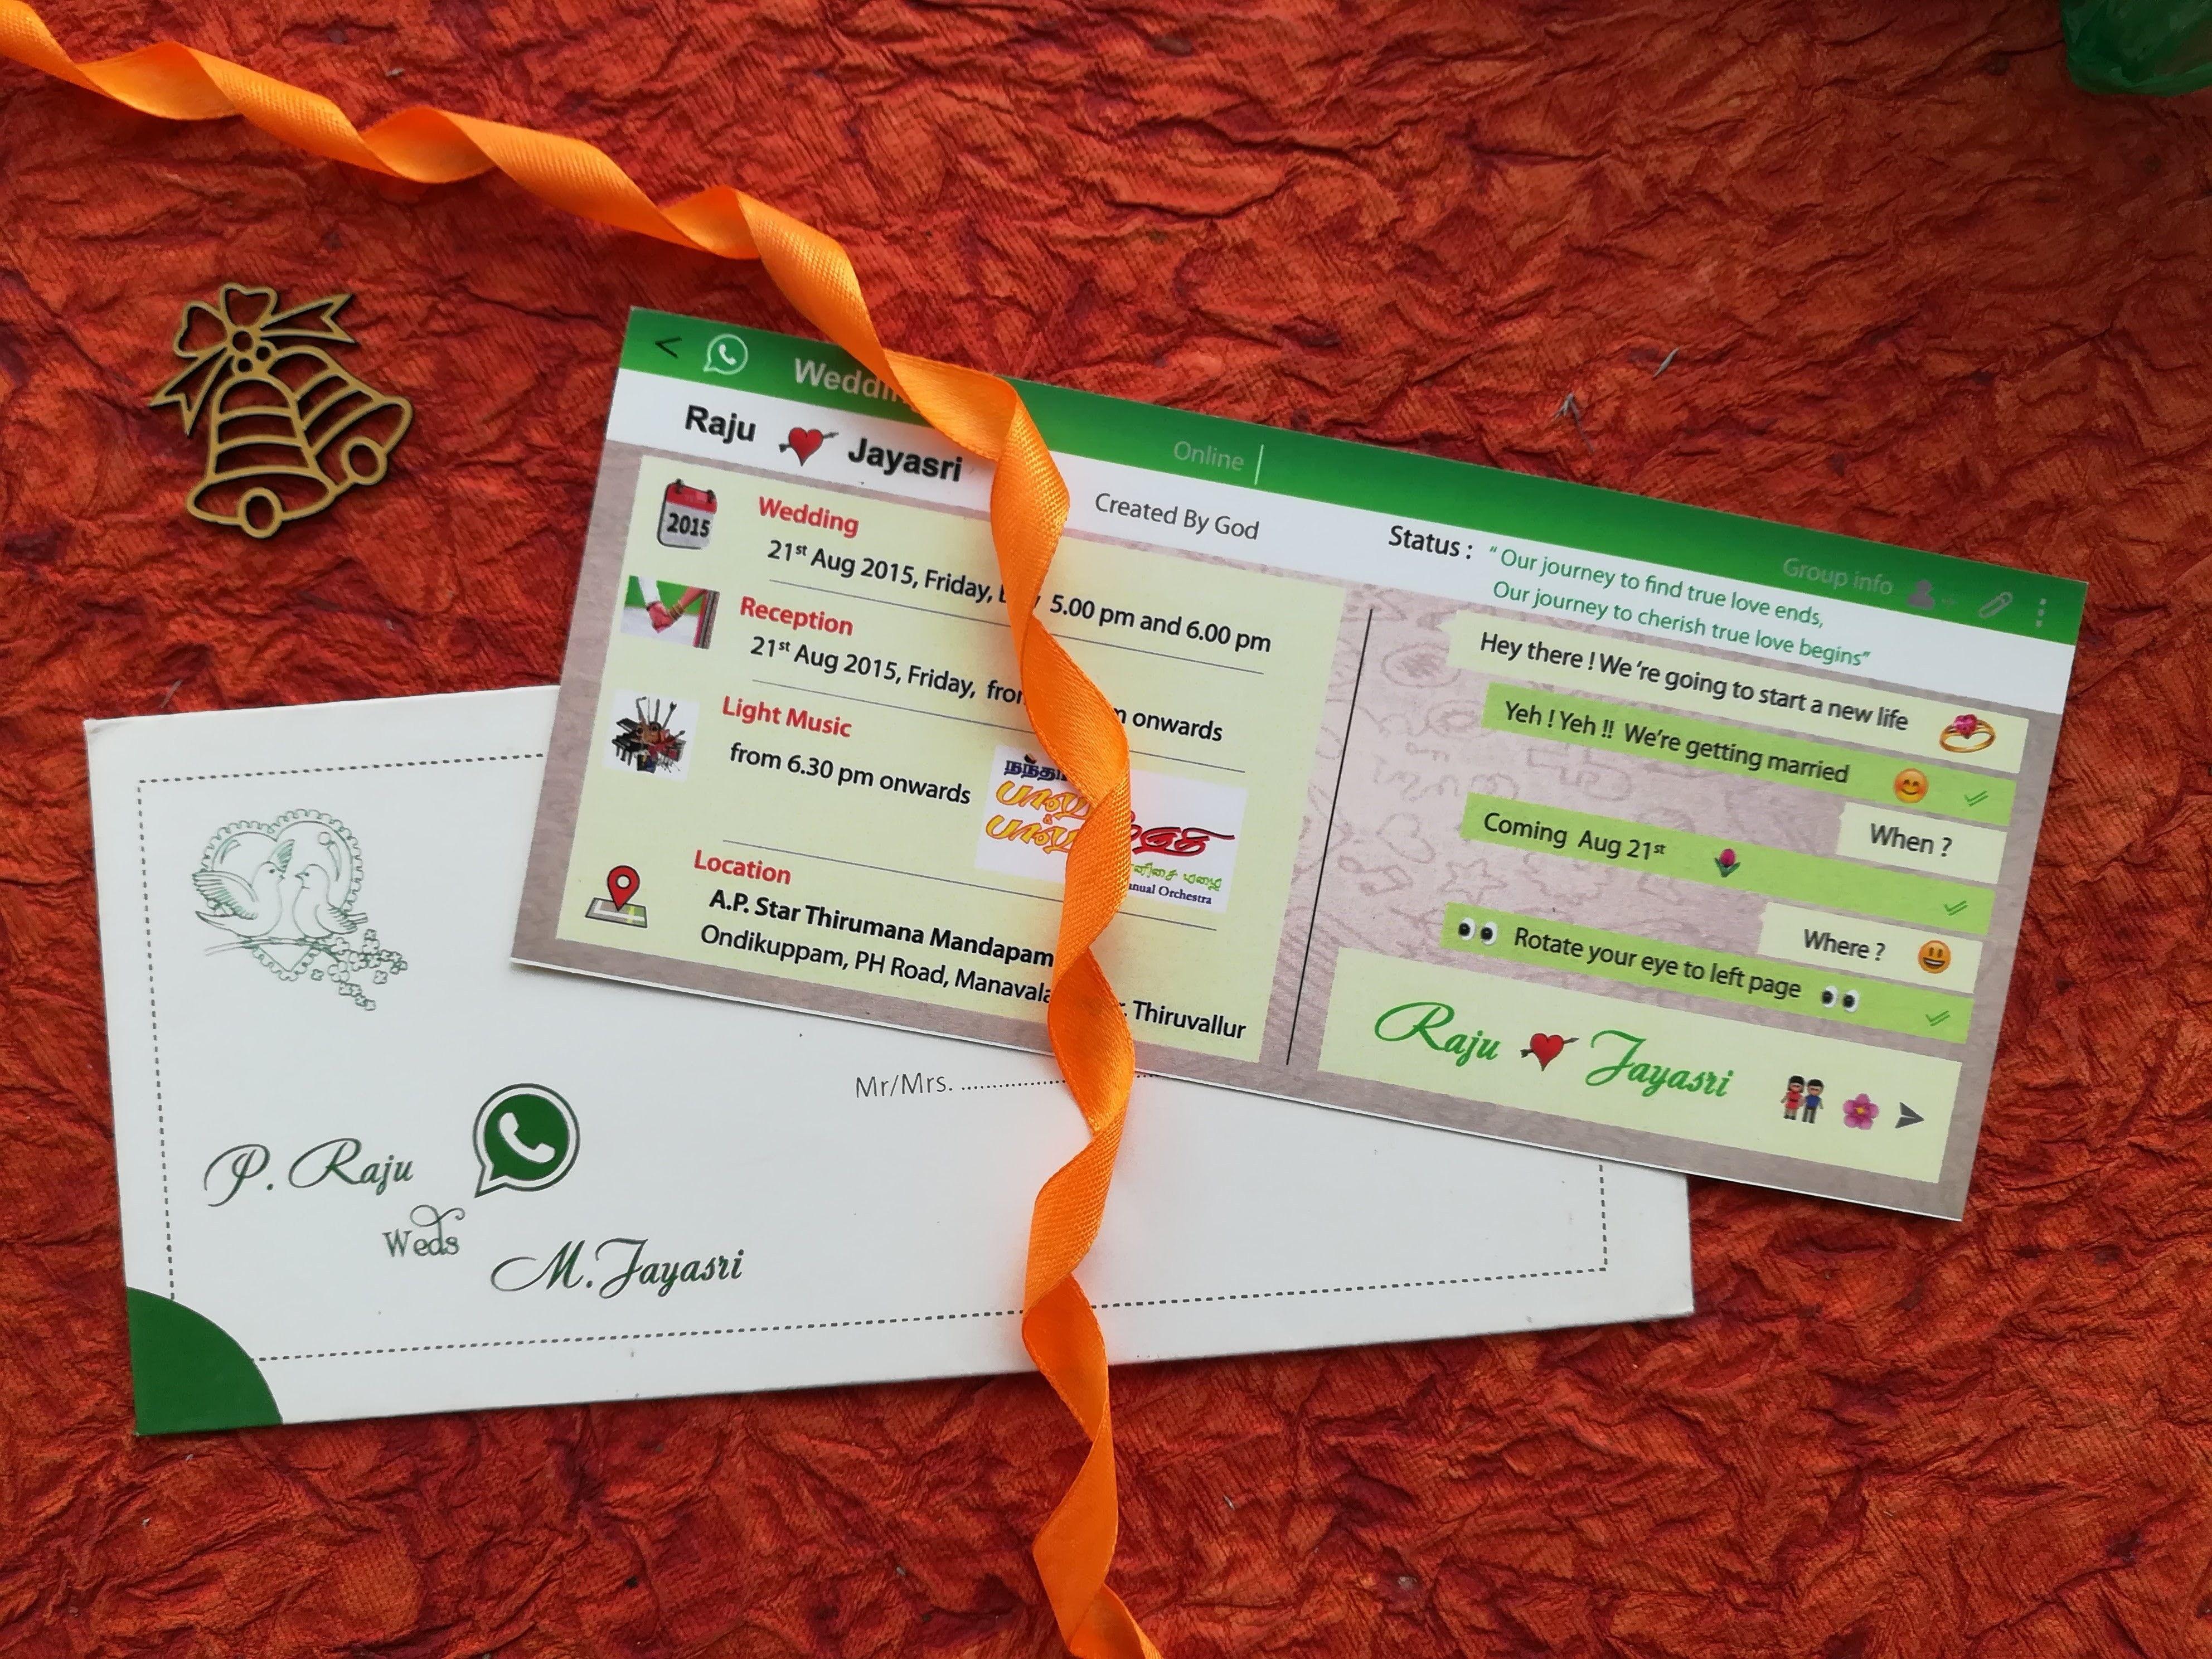 Quirky Whatsapp theme invite from the creative design team